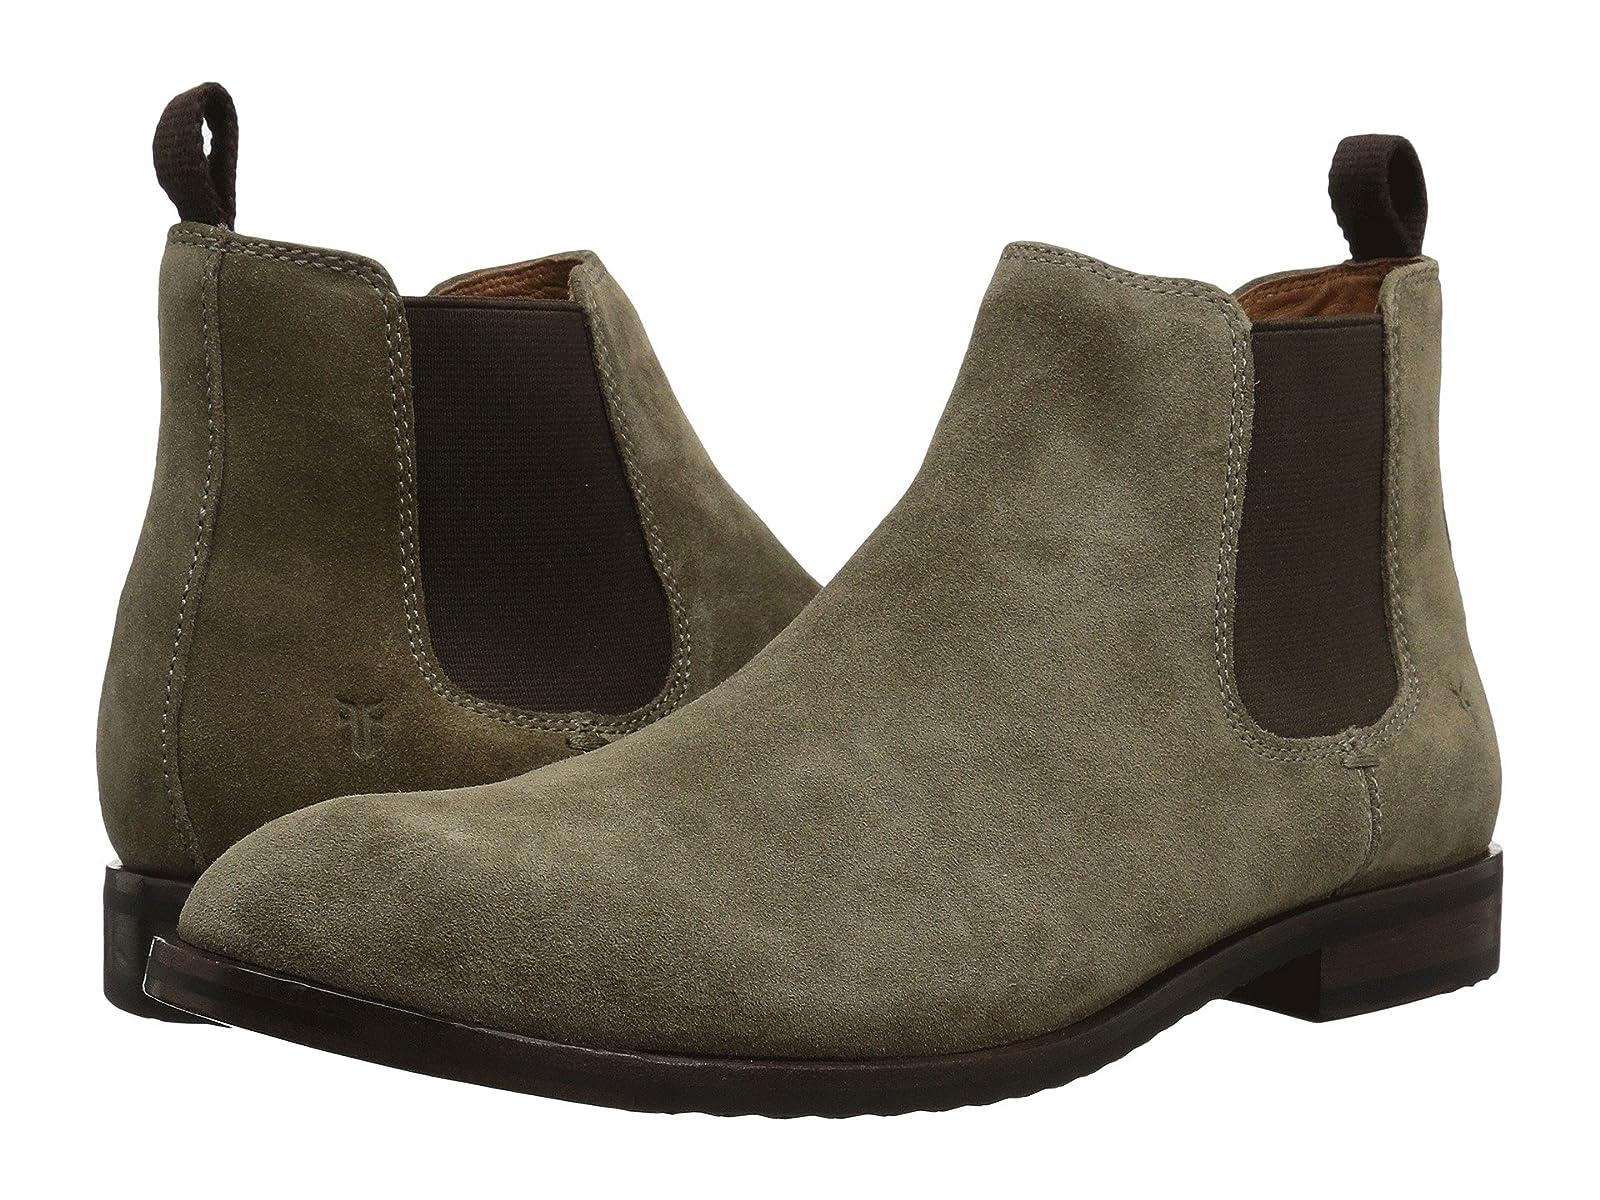 Frye Sam ChelseaCheap and distinctive eye-catching shoes